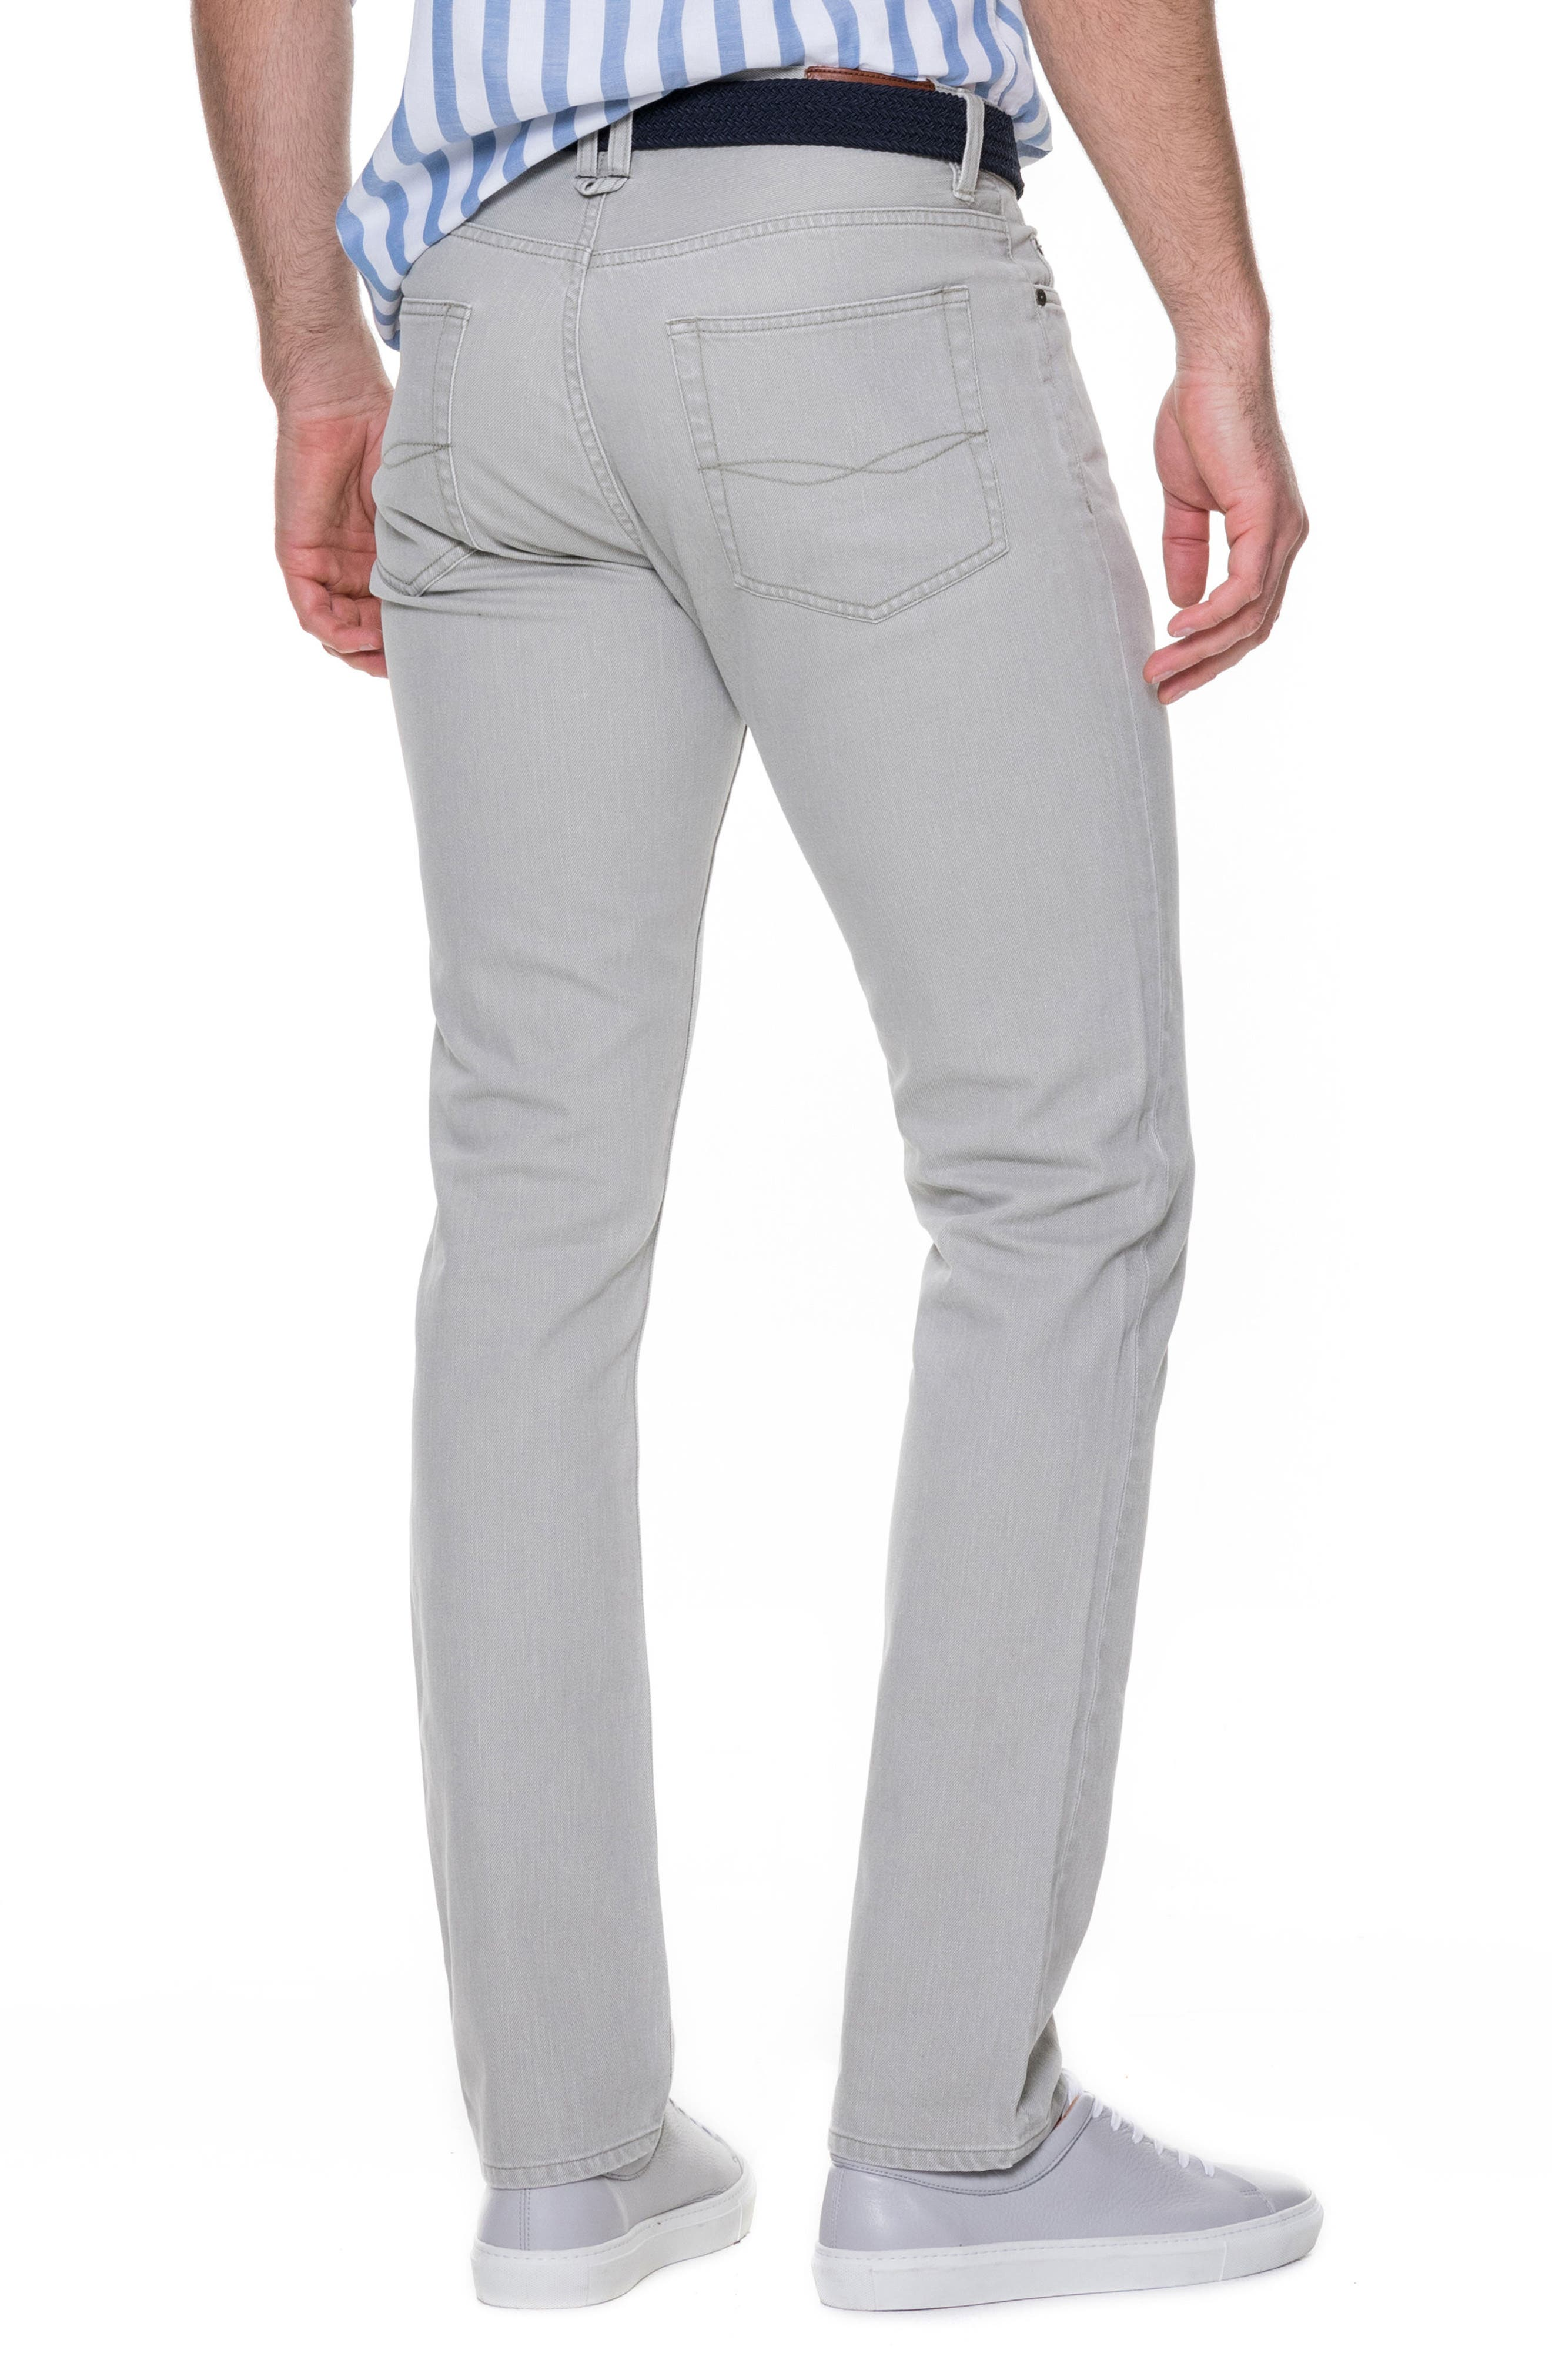 Tolson Straight Leg Jeans,                             Alternate thumbnail 2, color,                             249